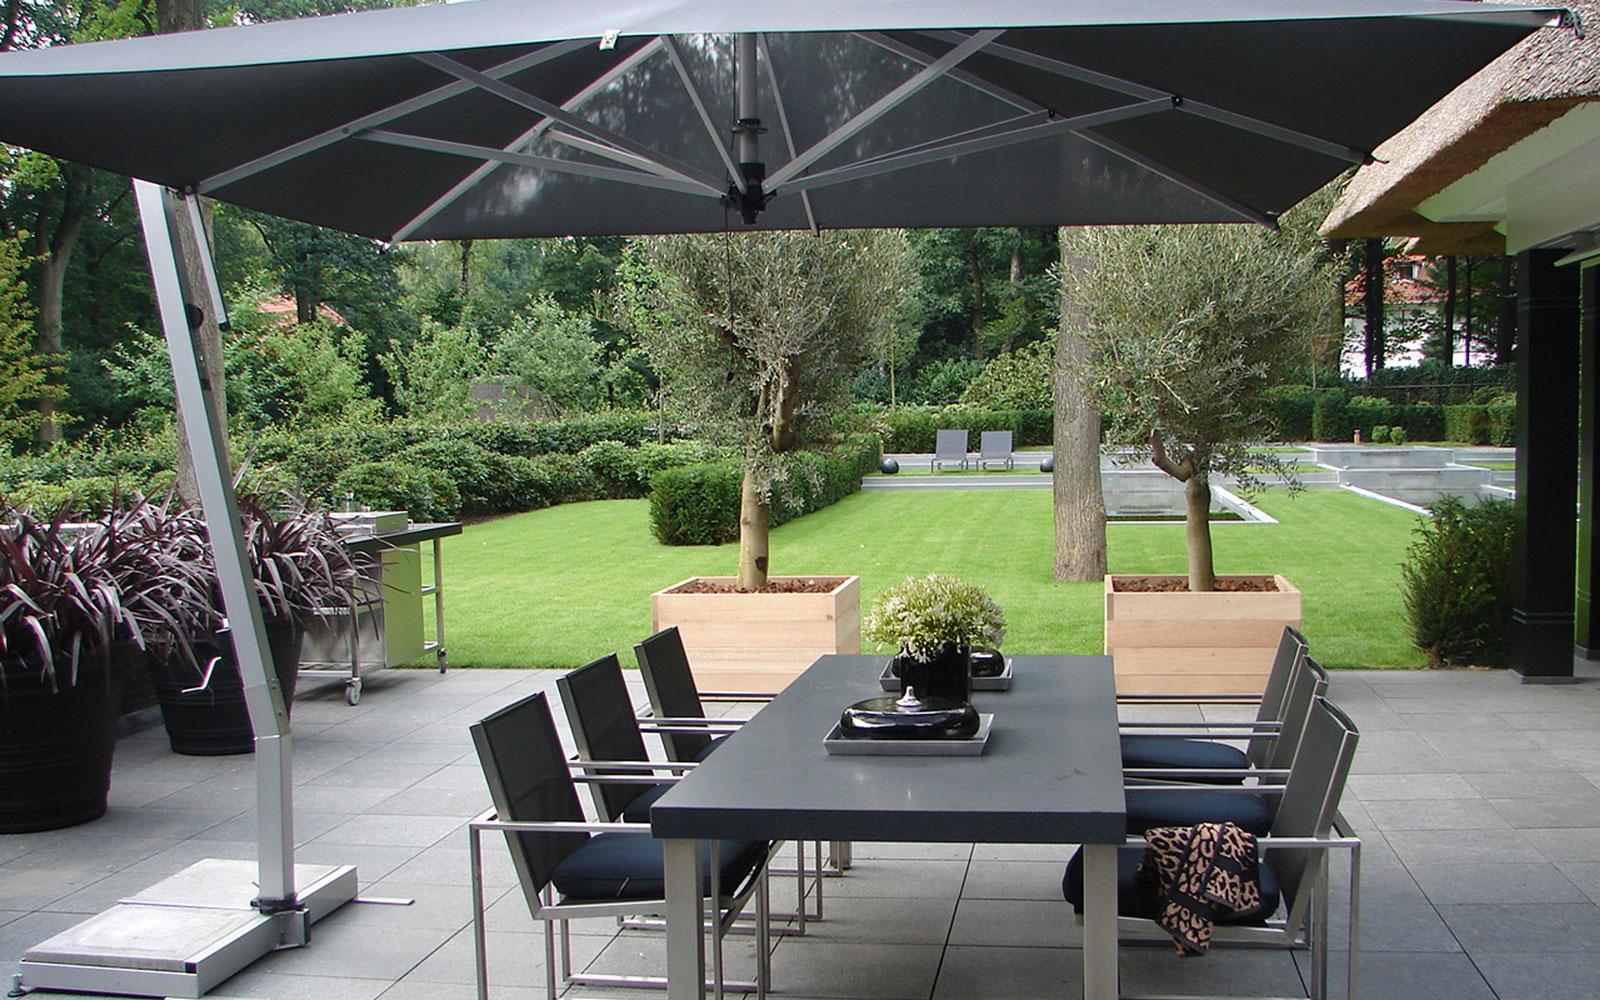 Tuin, tuinmeubelen, parasol, BOREK, outdoor living, riante villa, Leeflang Architectuur